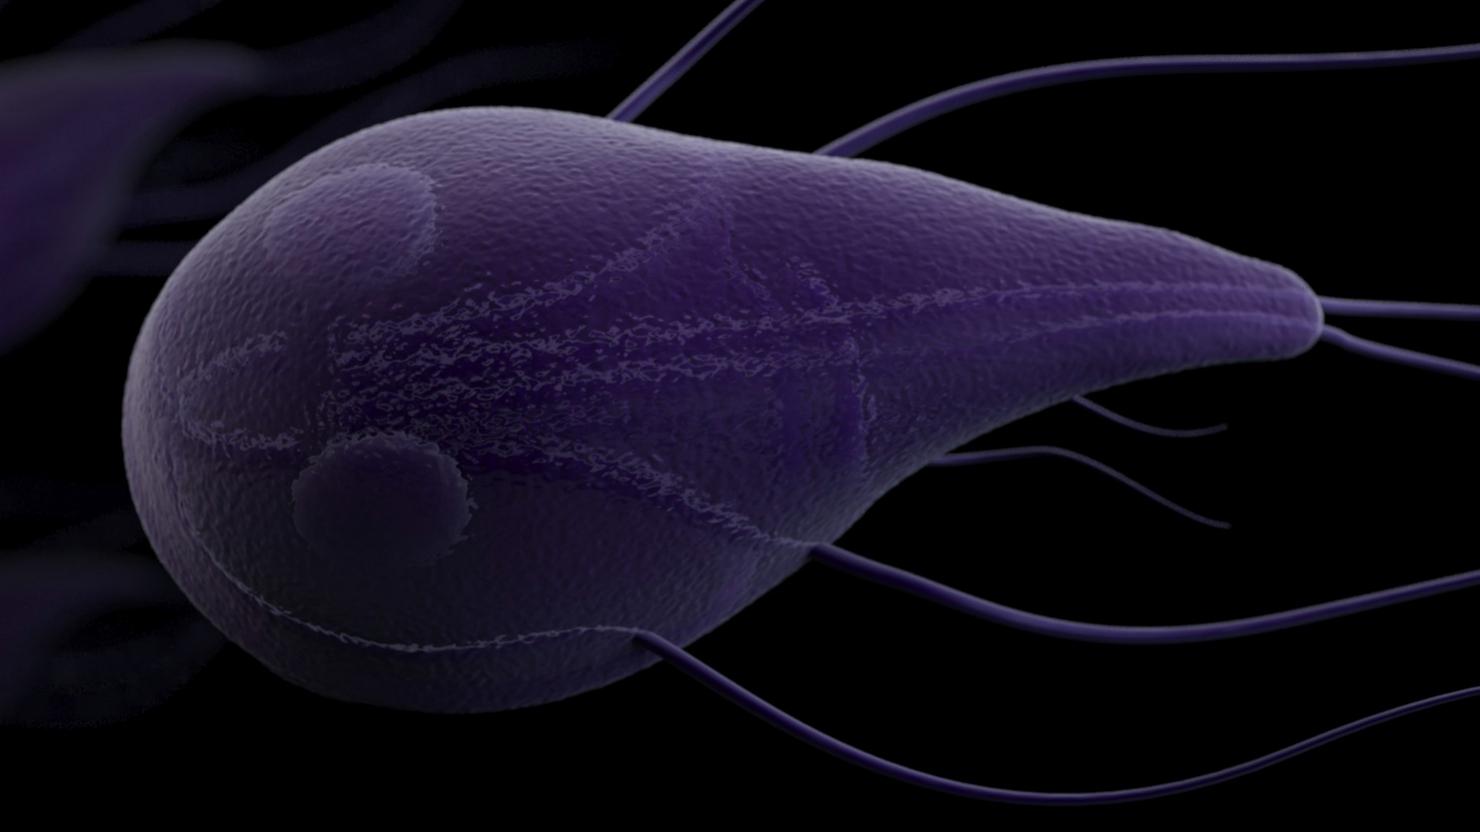 3D artist rendering of a Giardia parasite